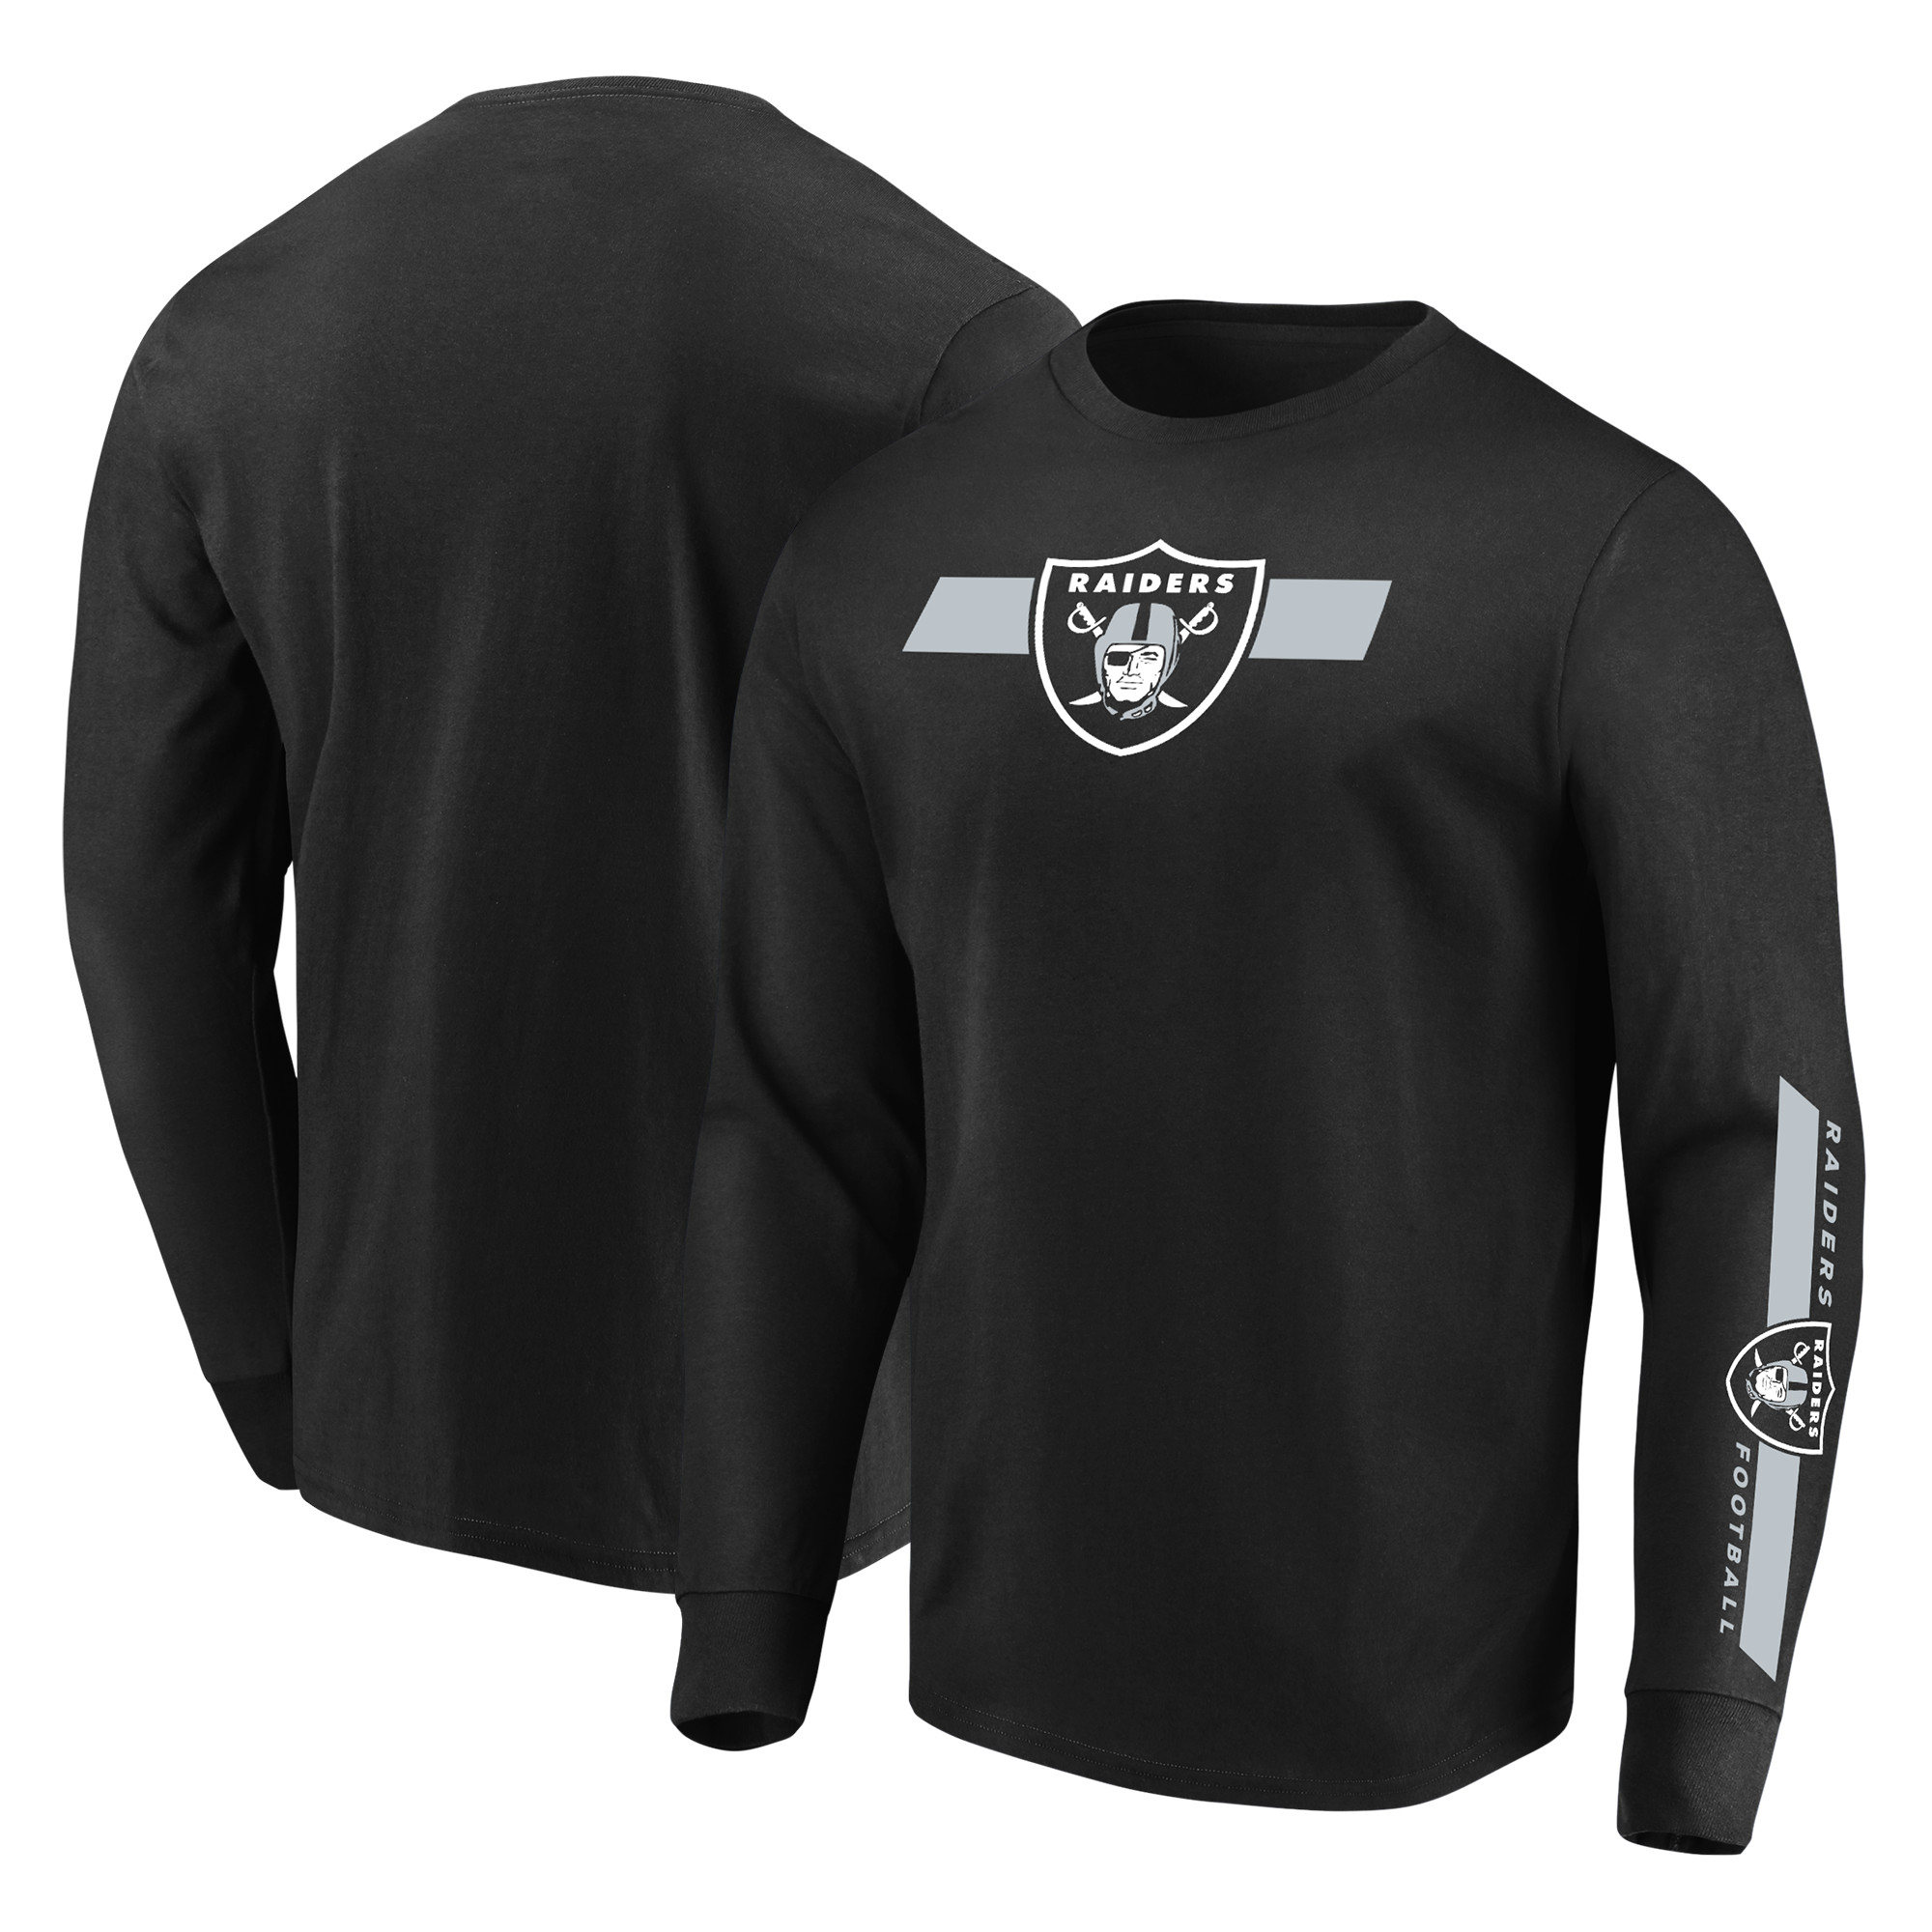 Oakland Raiders Majestic Dual Threat Long Sleeve T-Shirt - Black